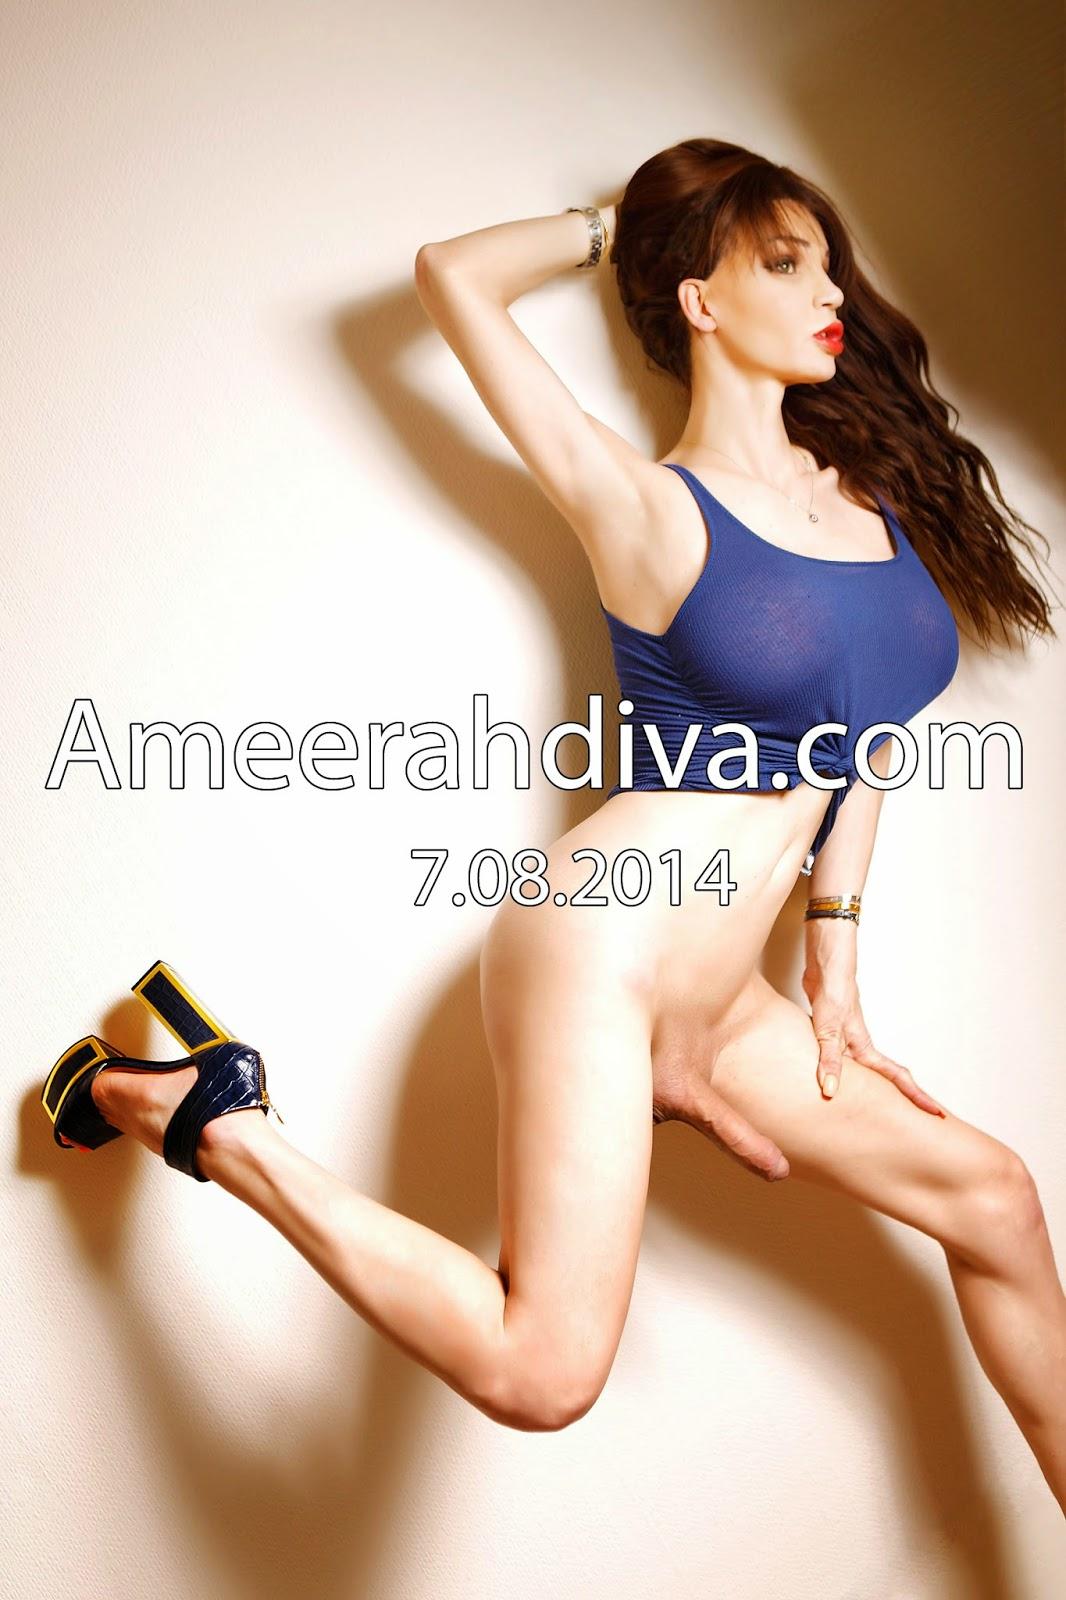 arab gay escort escort casalecchio